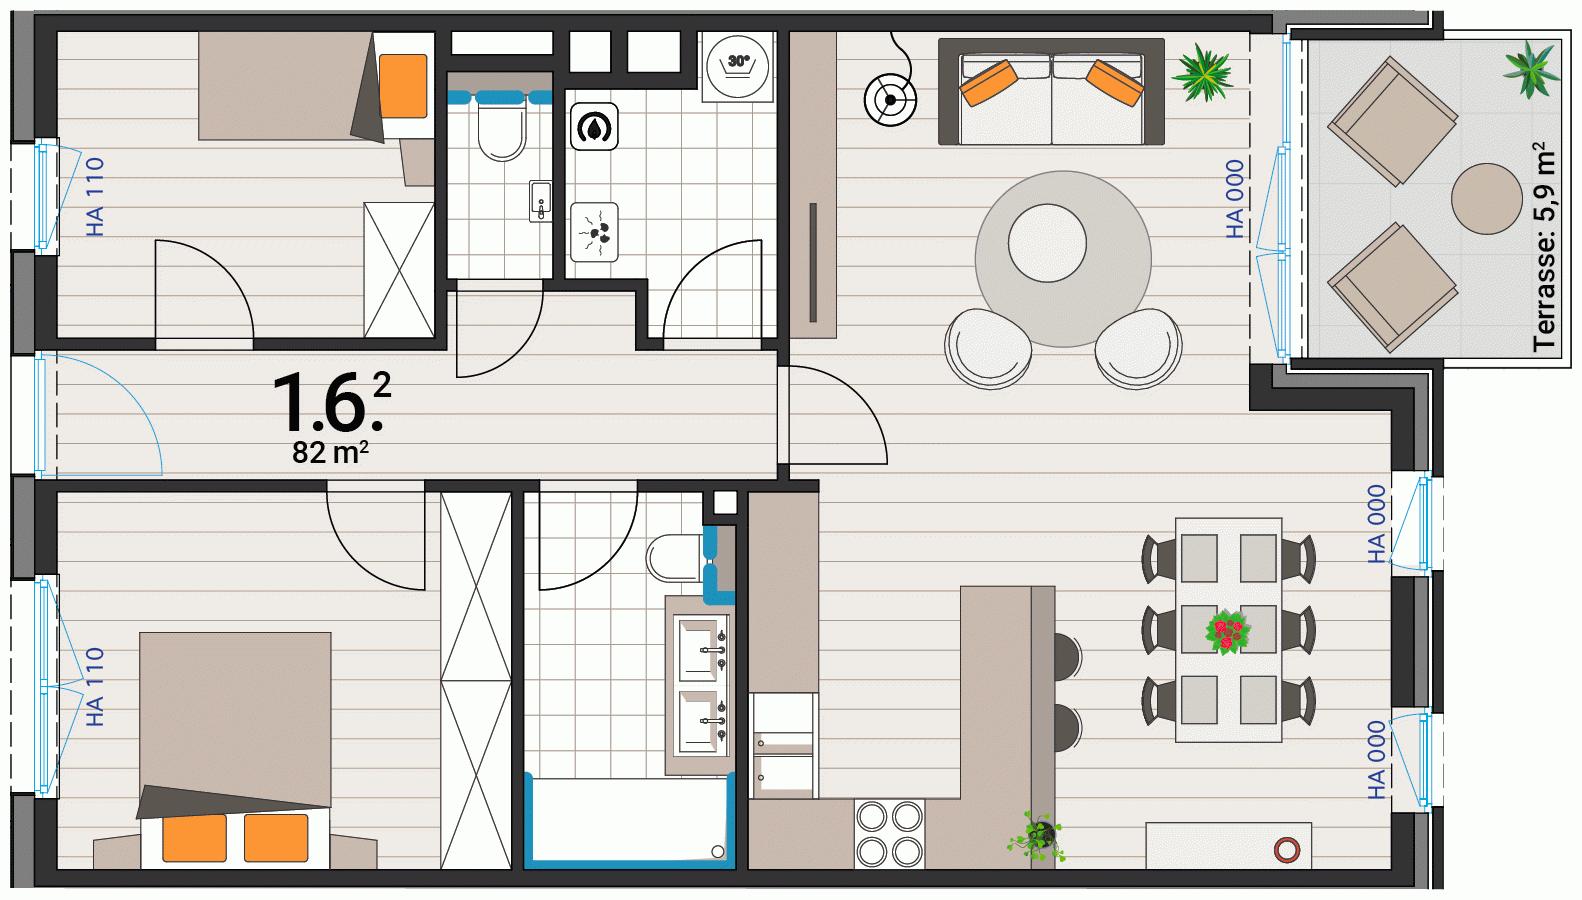 Appartement 1.6.